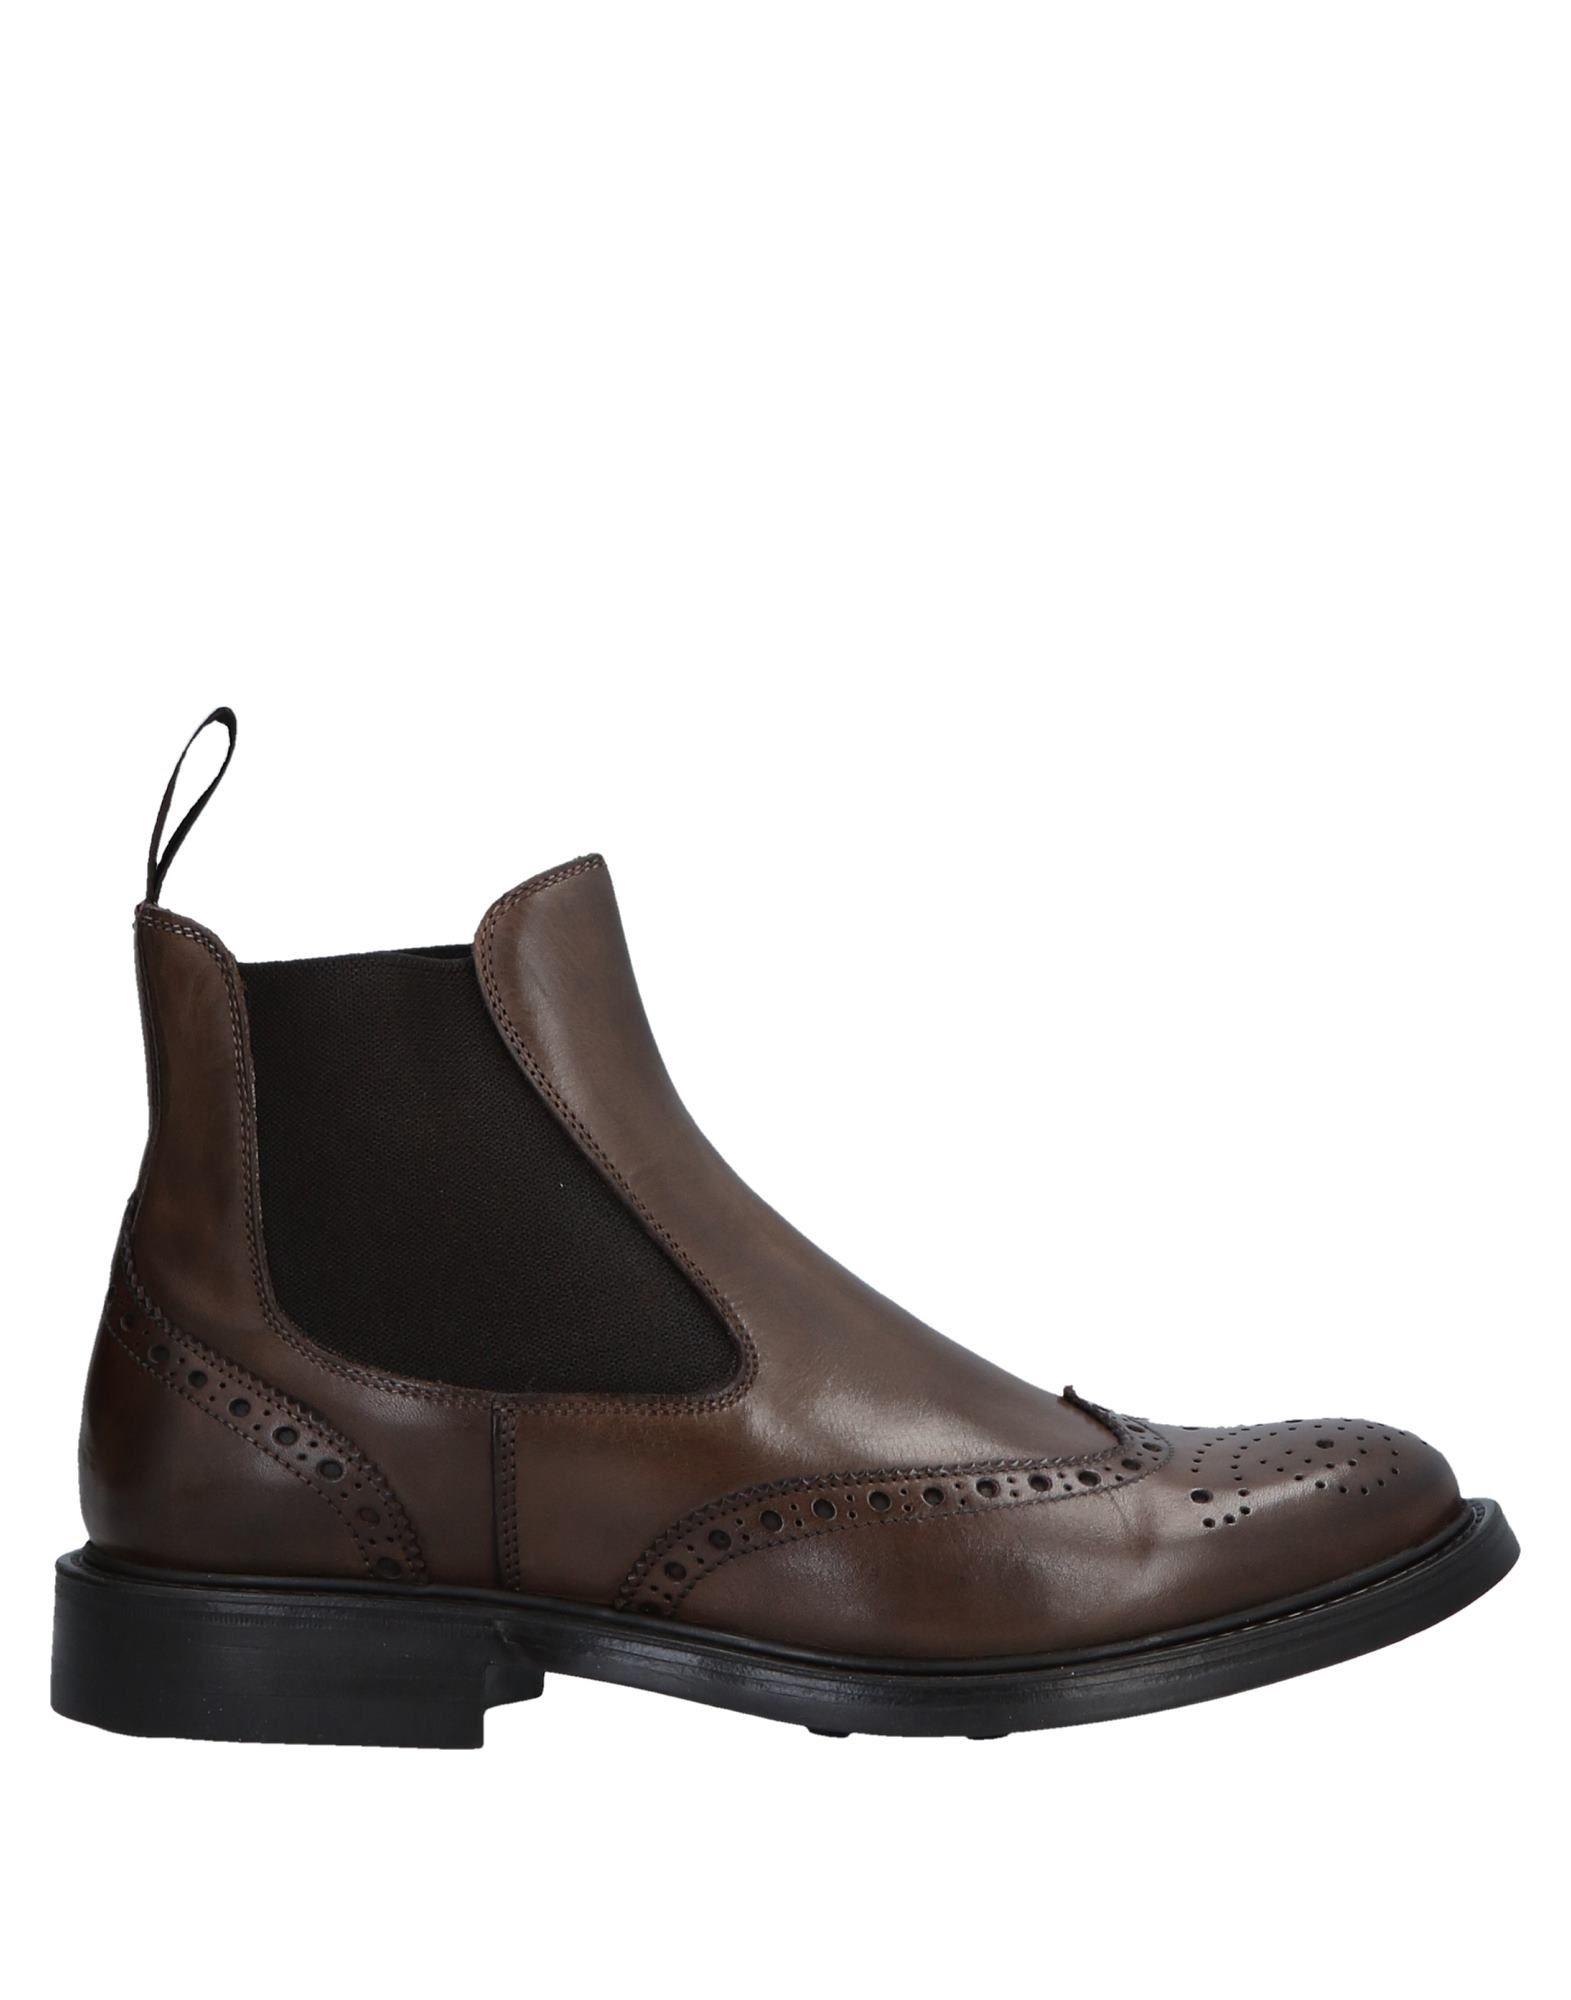 Rabatt echte Stiefelette Schuhe Winsor Stiefelette echte Herren  11522902MR 75e2c1